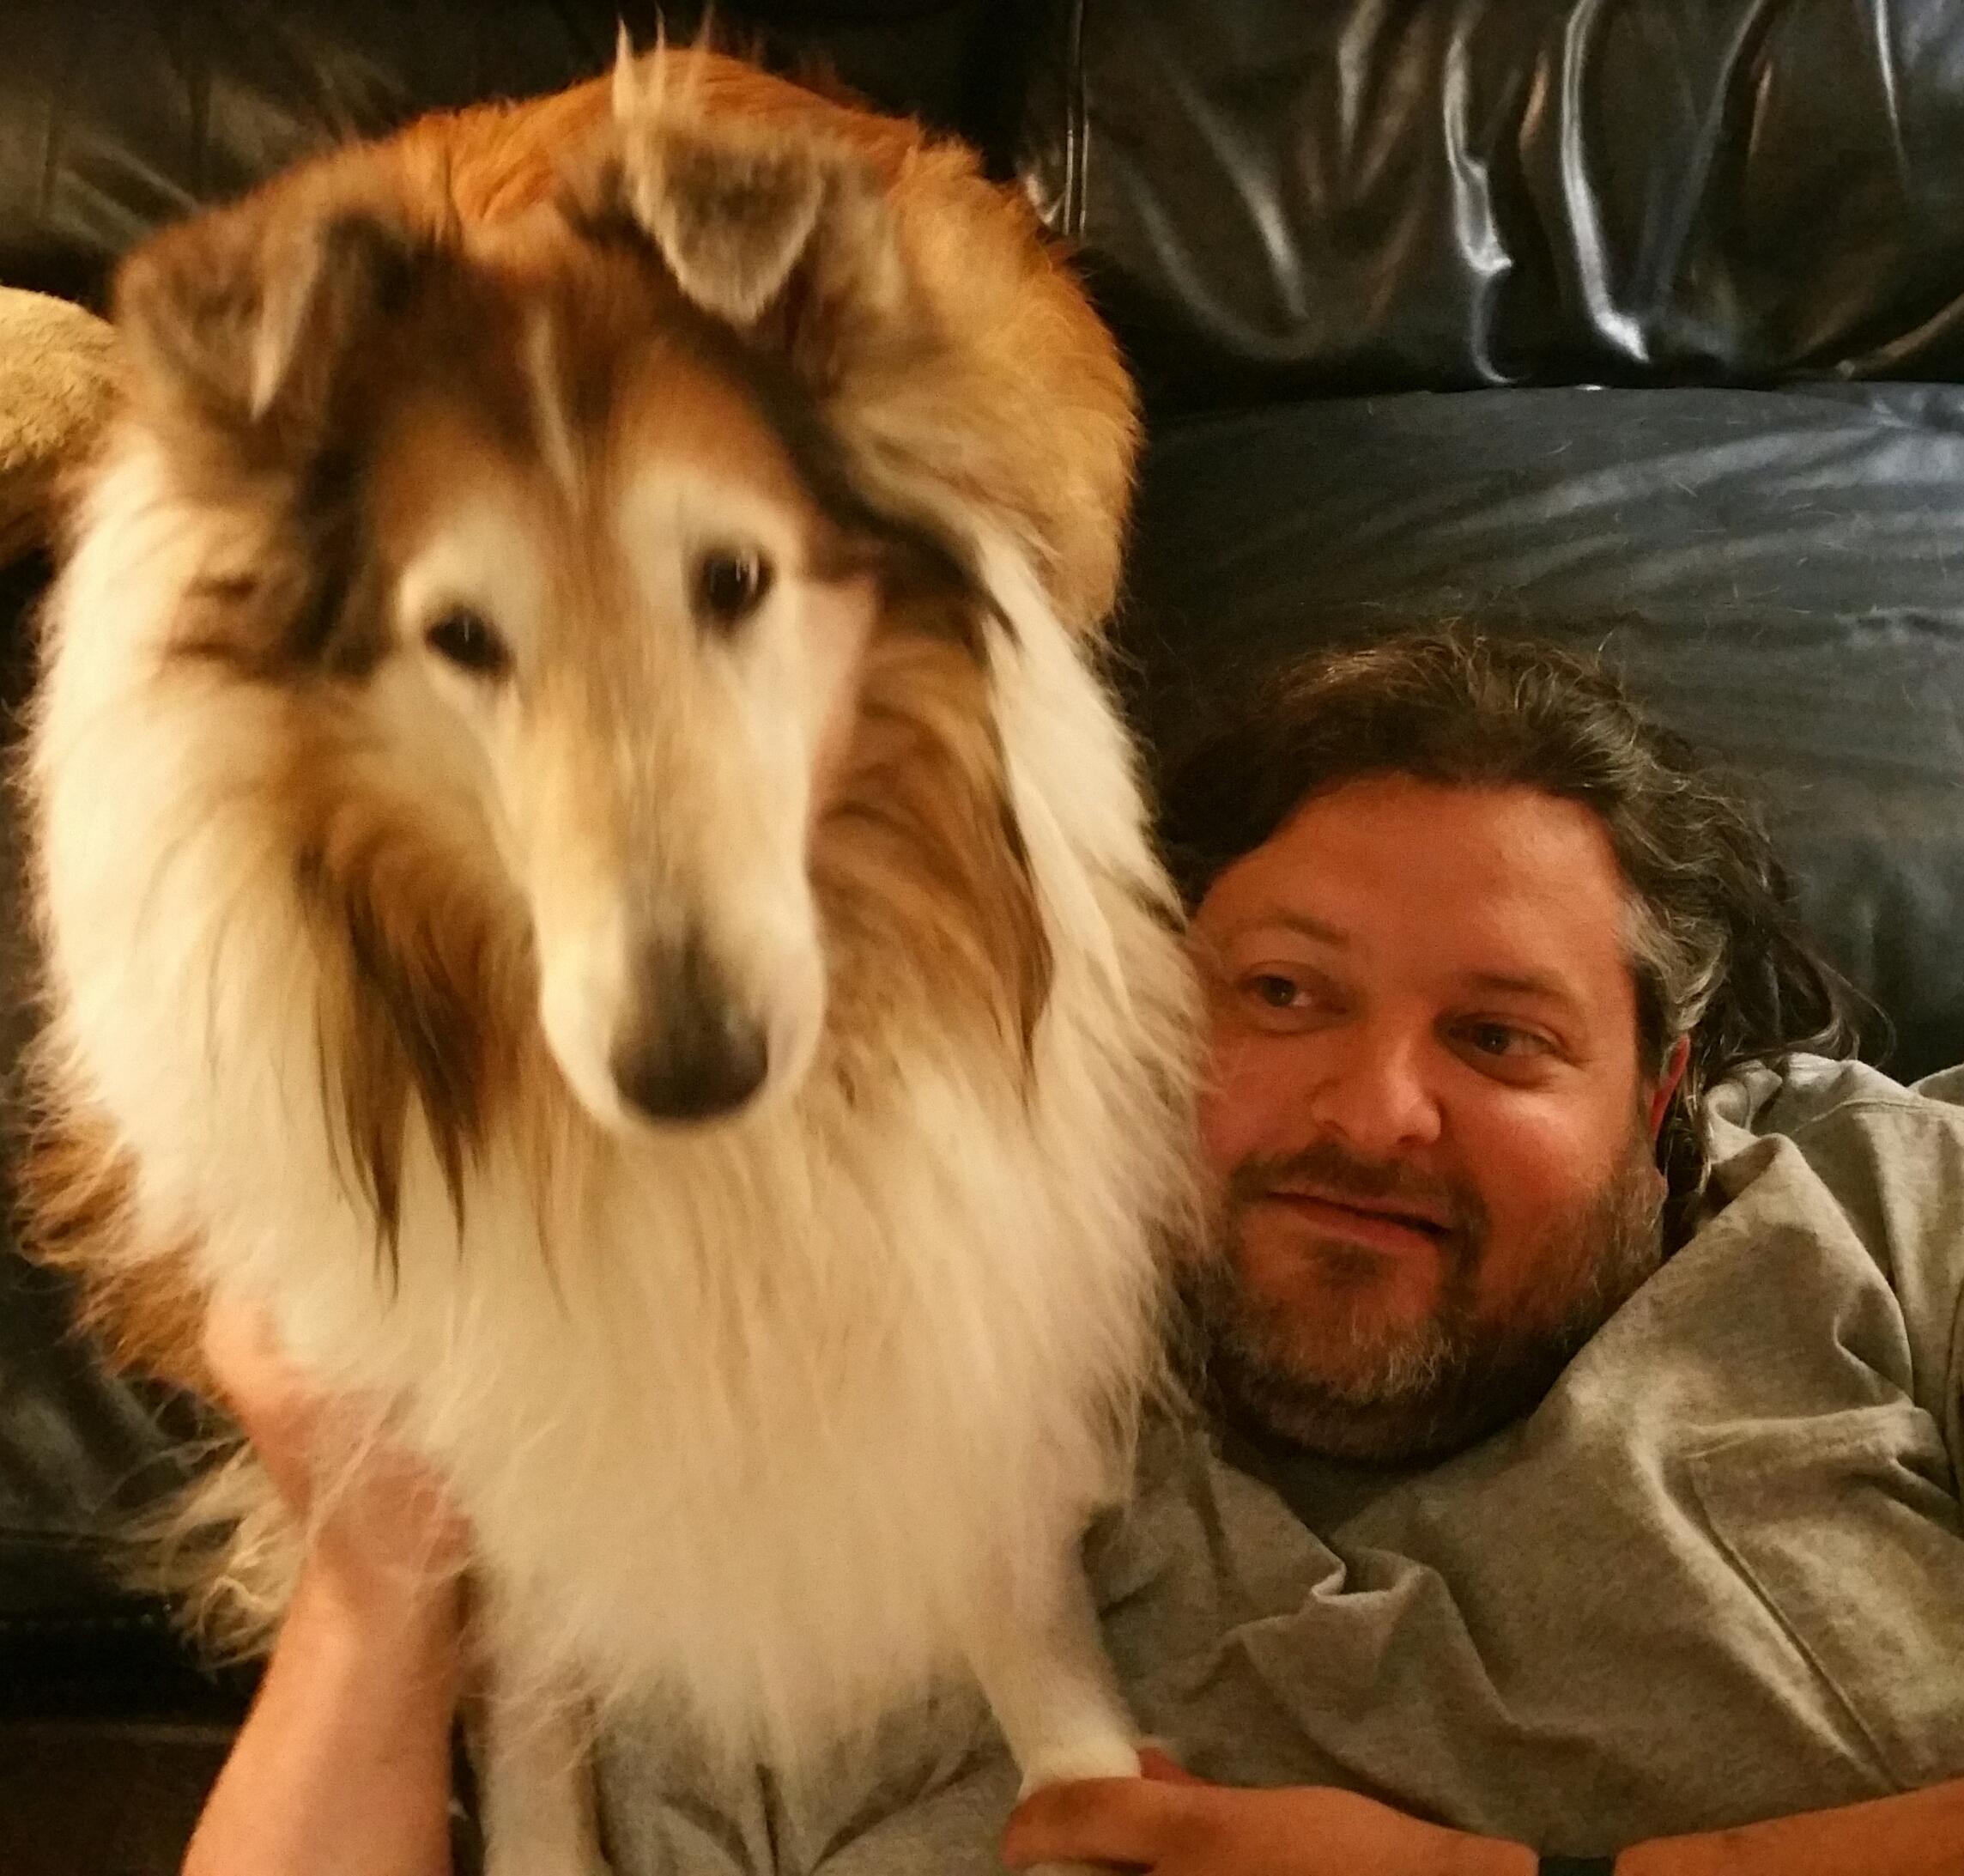 Bill Howard : -Behaviorist and Owner of Top Dog Canine Behavioral Training